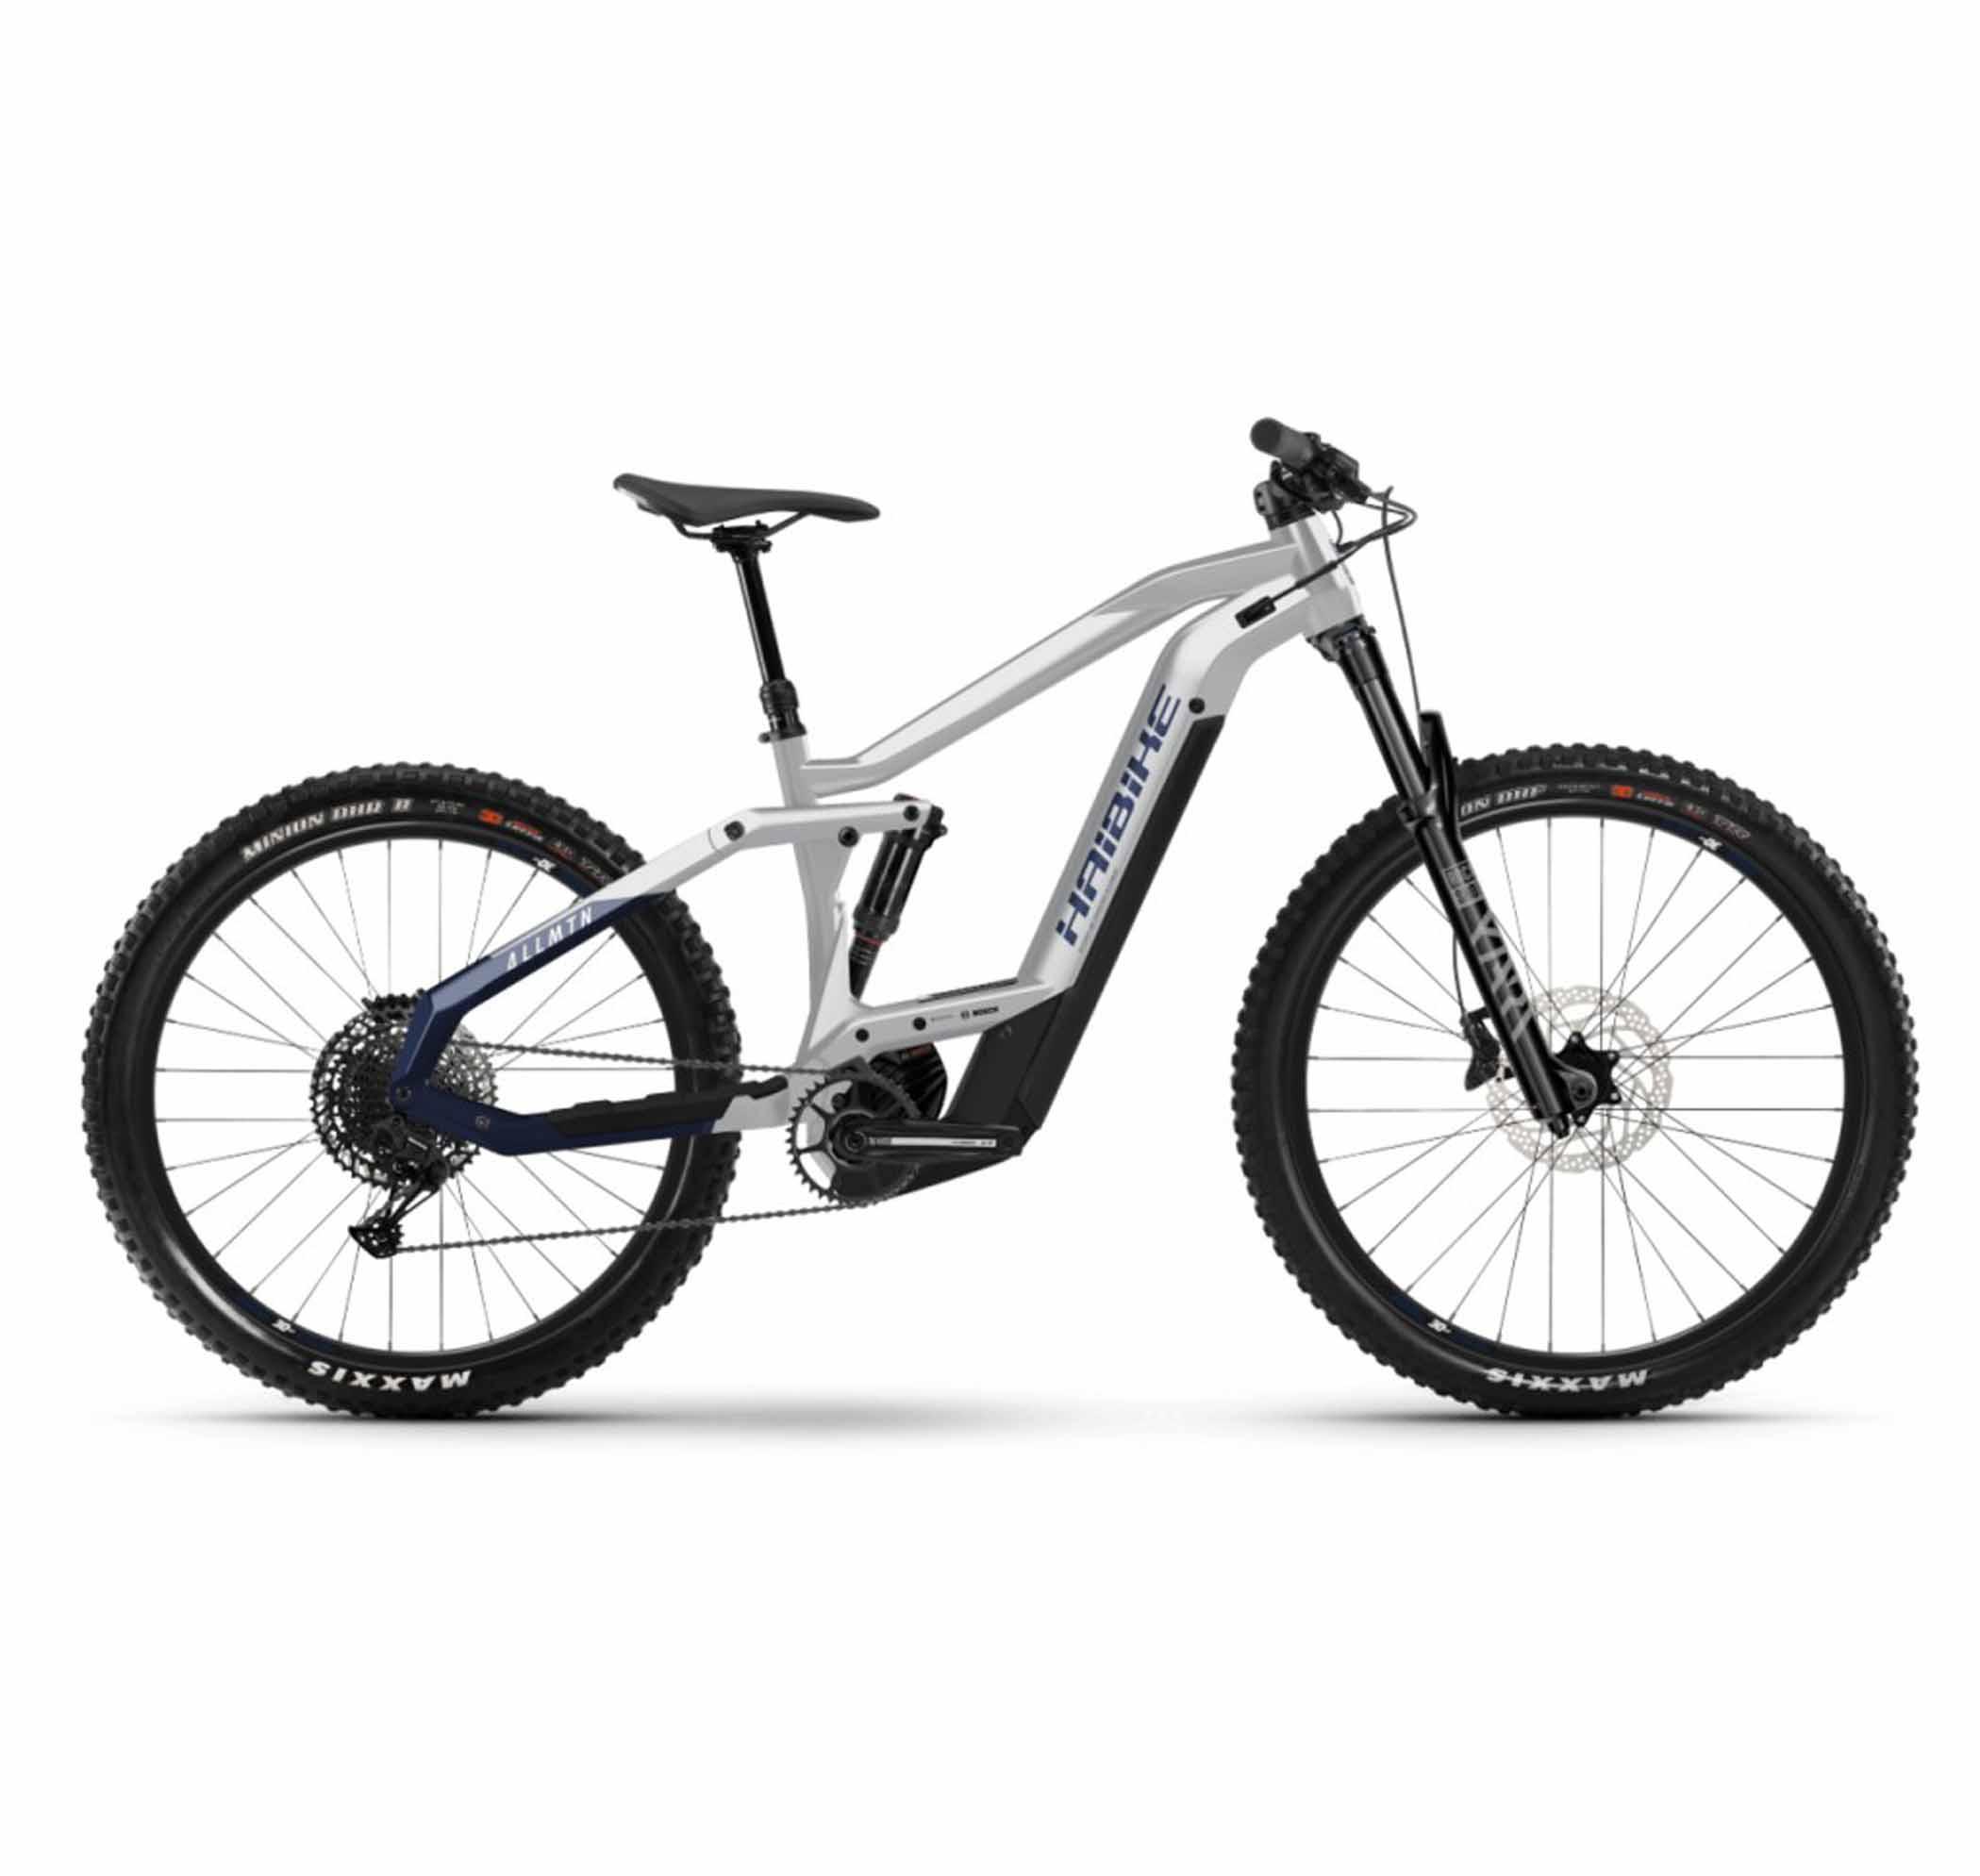 Haibike_Rodeo_Bike_Bosch_Allmtn_3_White